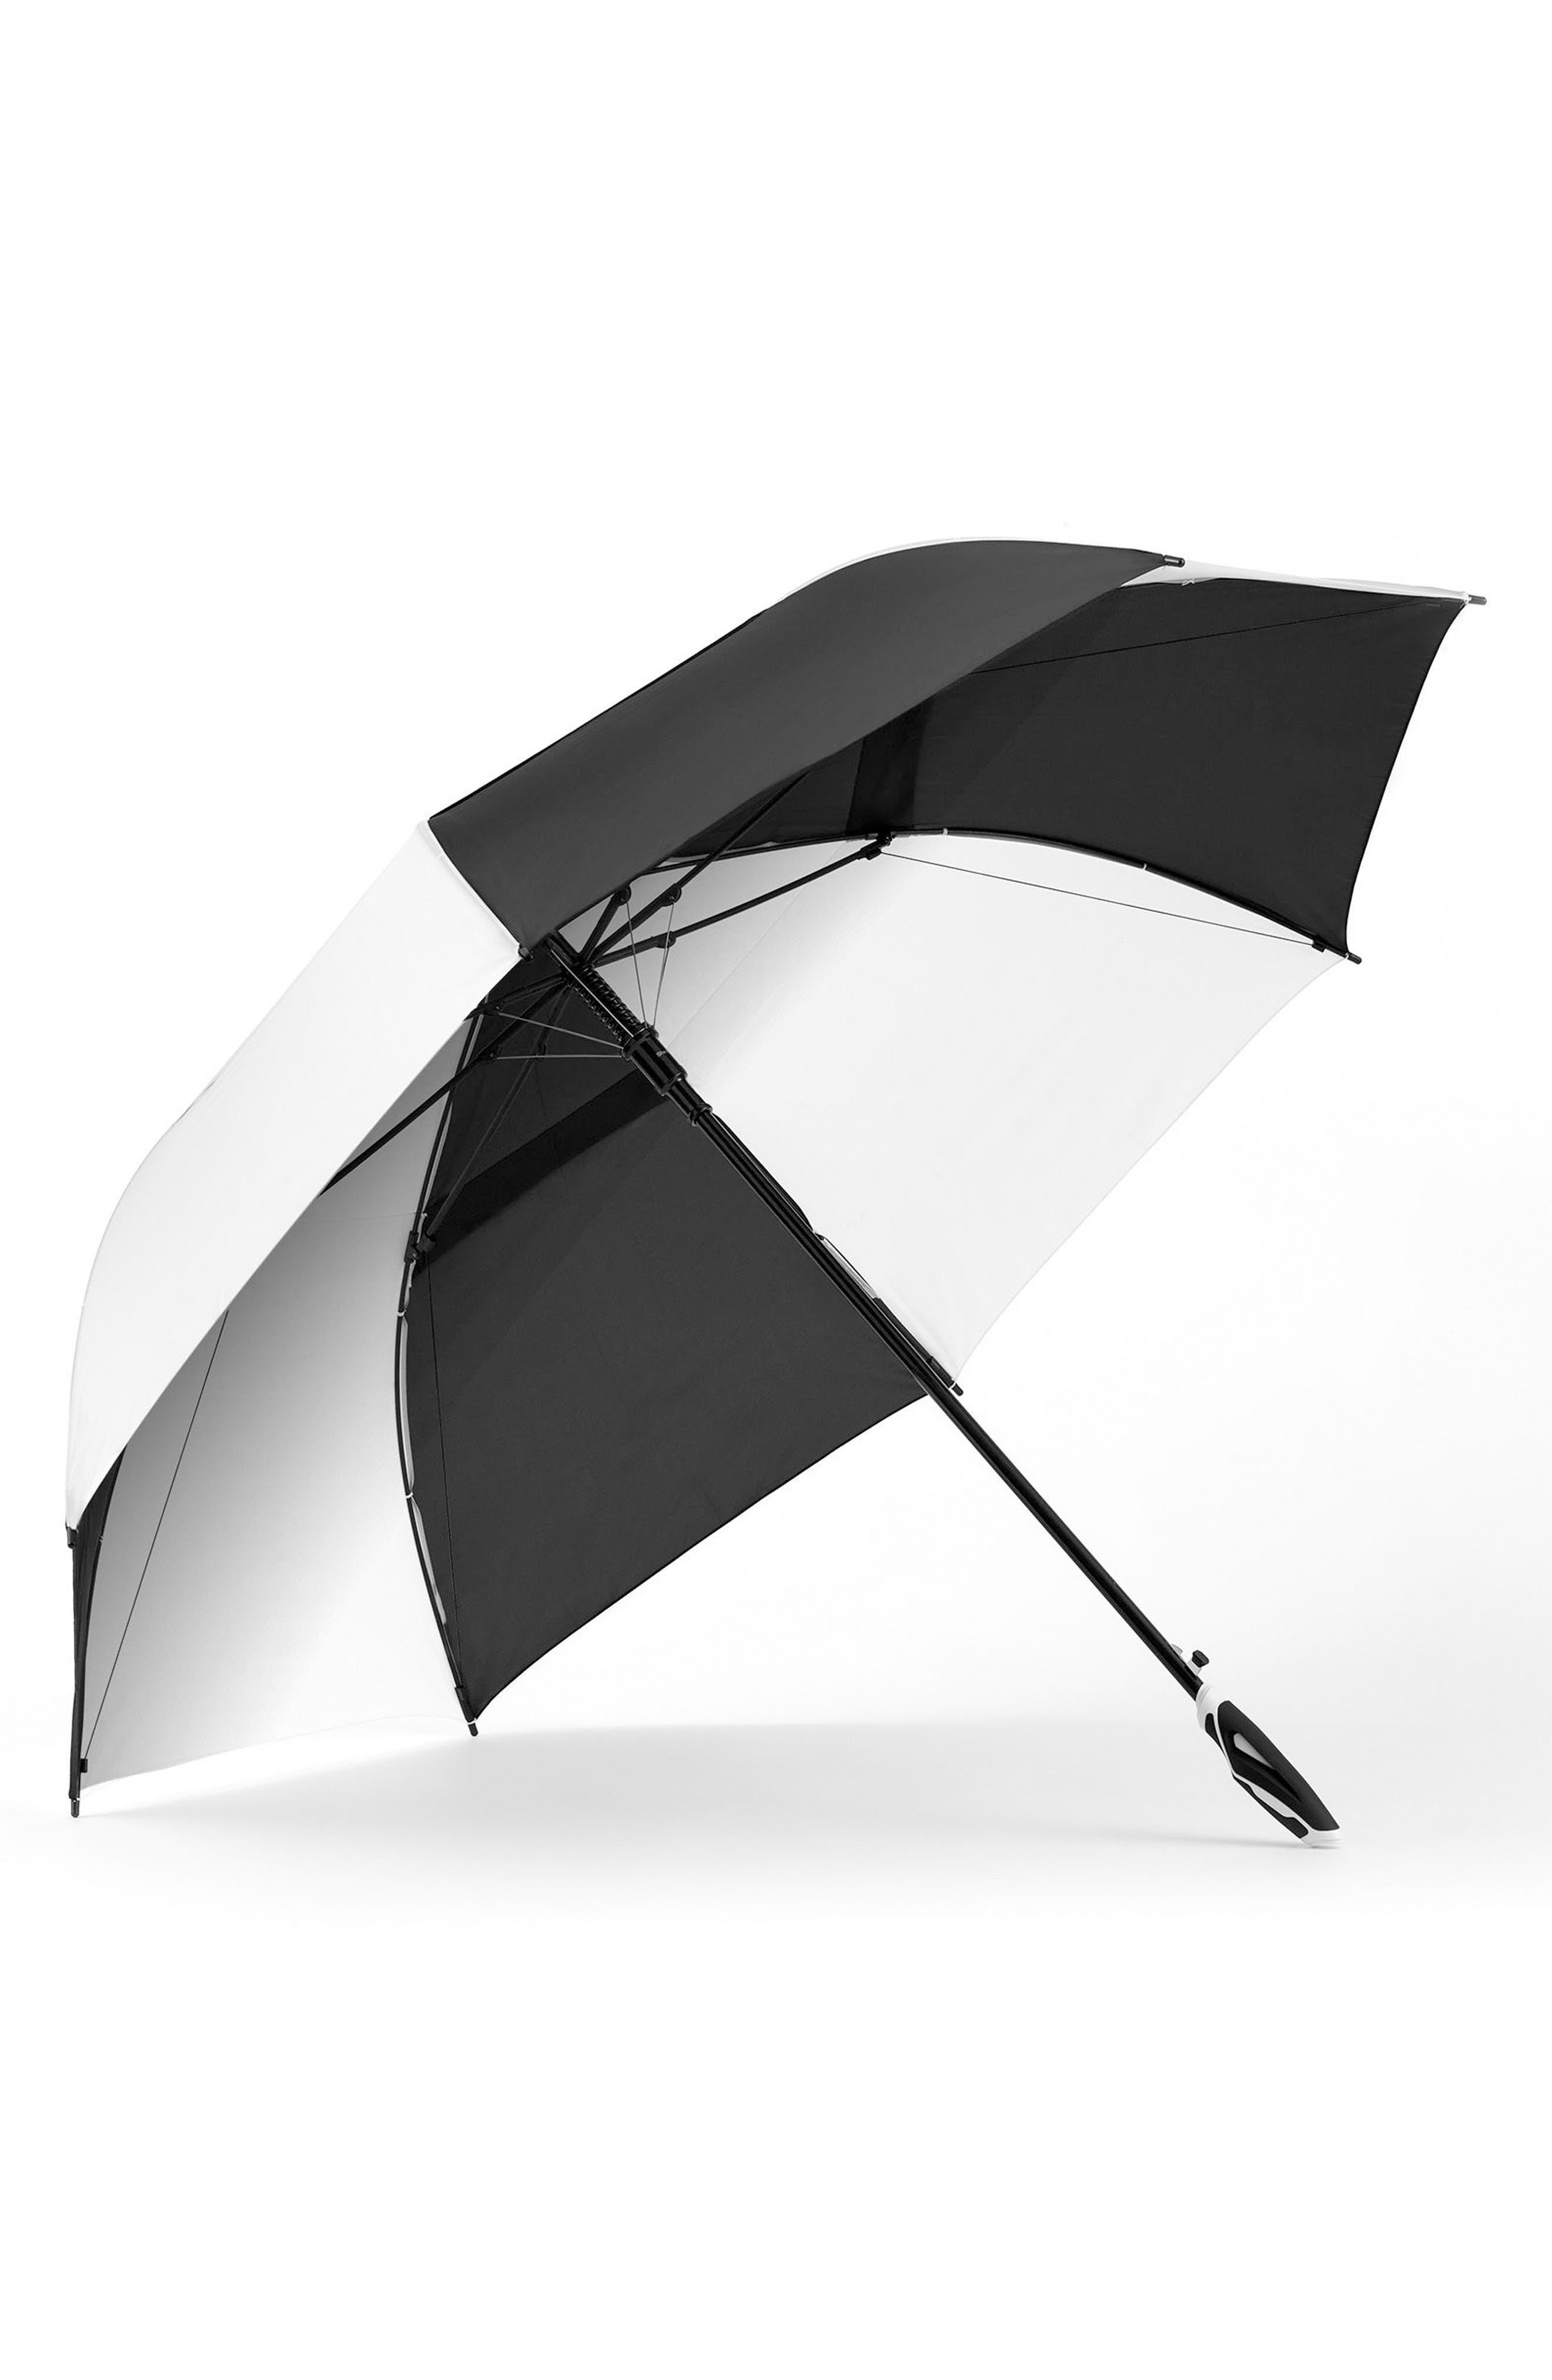 ShedRain 'WindJammer®' Auto Open Golf Umbrella